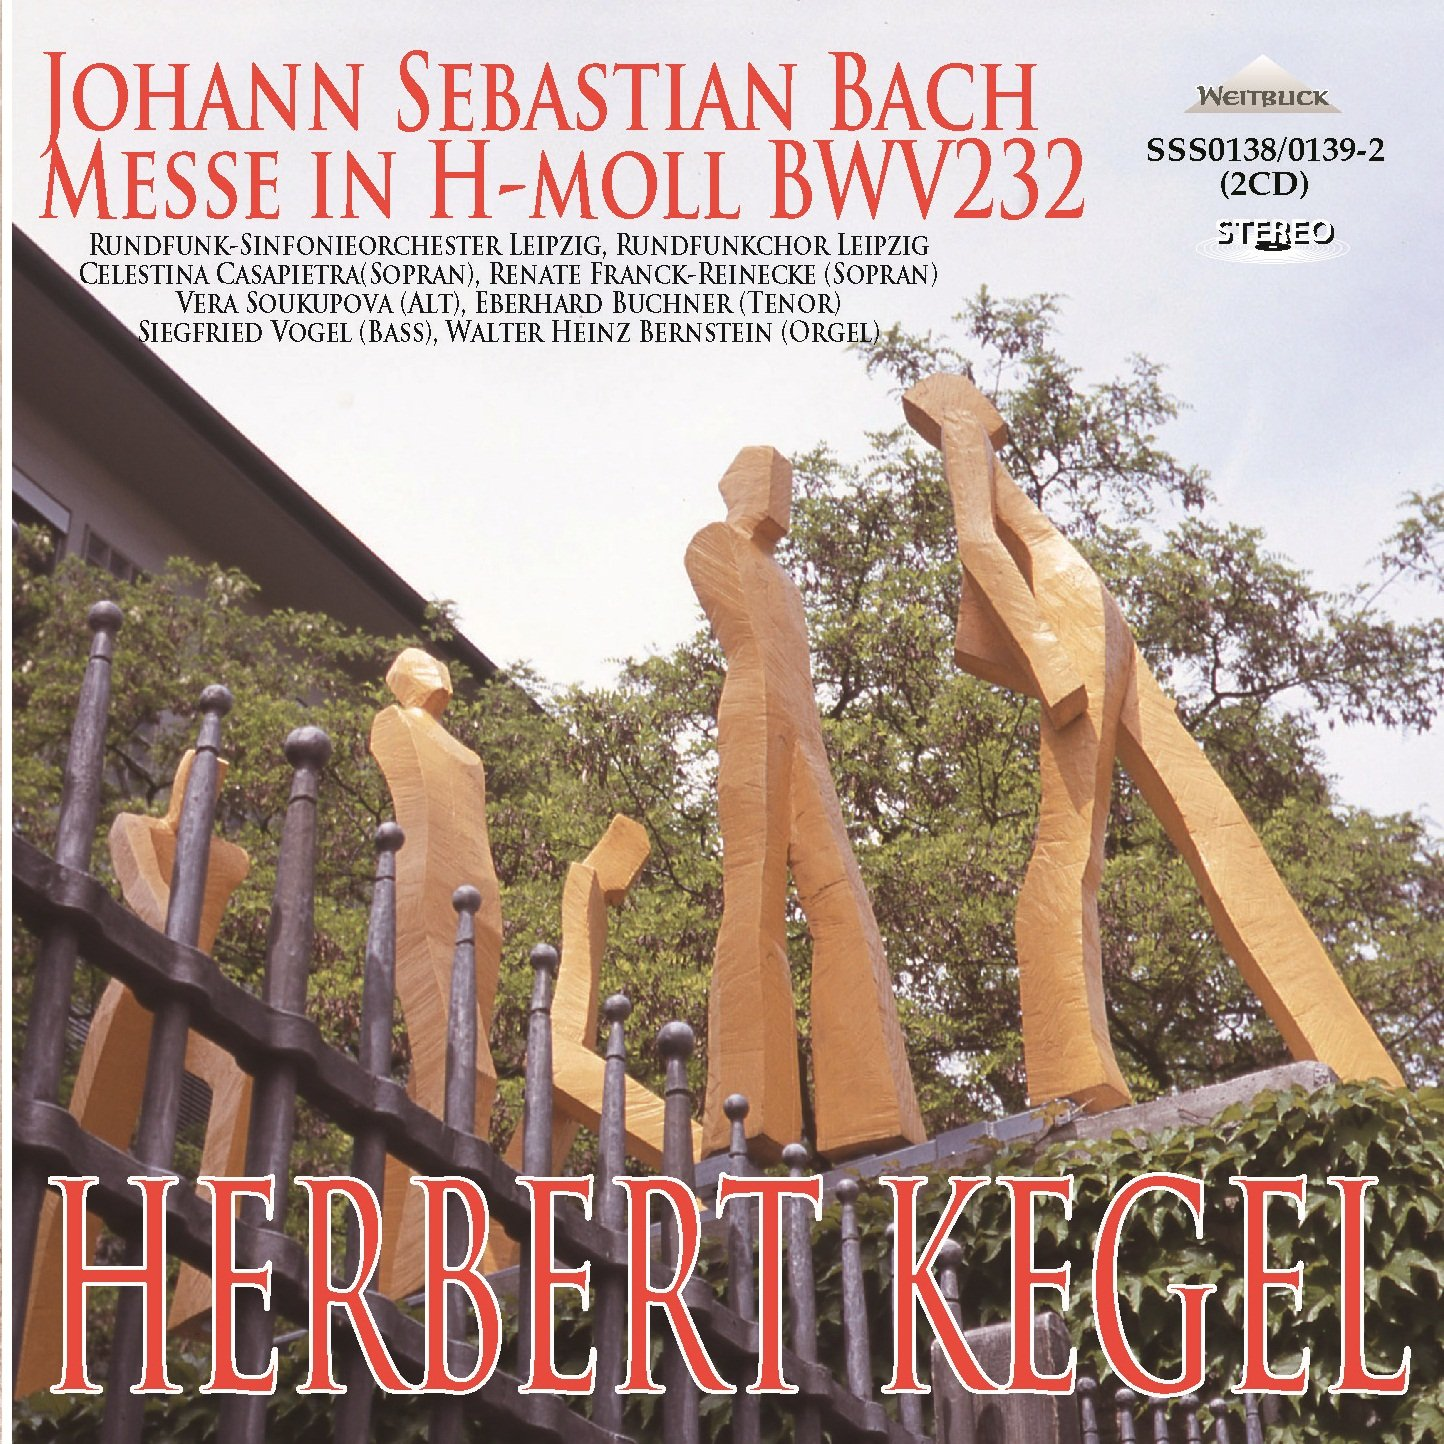 Bach Mass In B. (Celestina Casapietra And Renate Franck-Reinecke Sopranos. Vera Soukupova Al by WEITBLICK